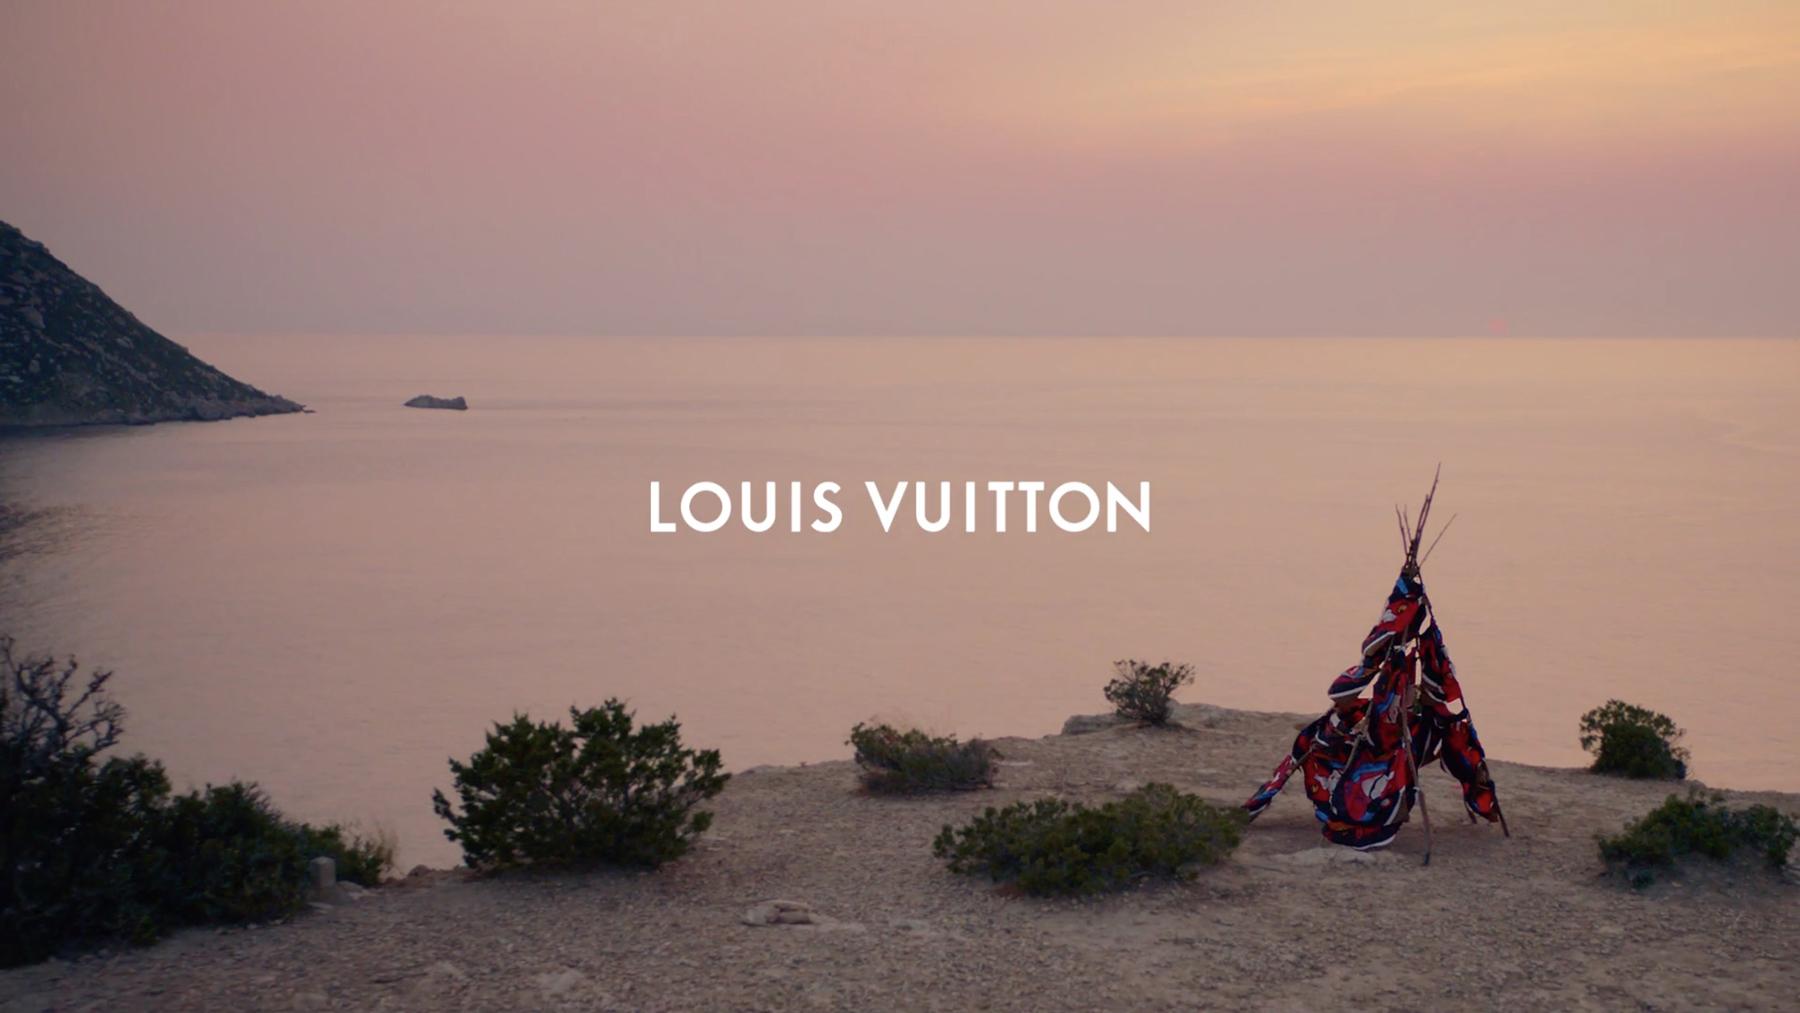 Louis-Vuitton_SantaIbiza_Alicia_Vikander_11.jpg